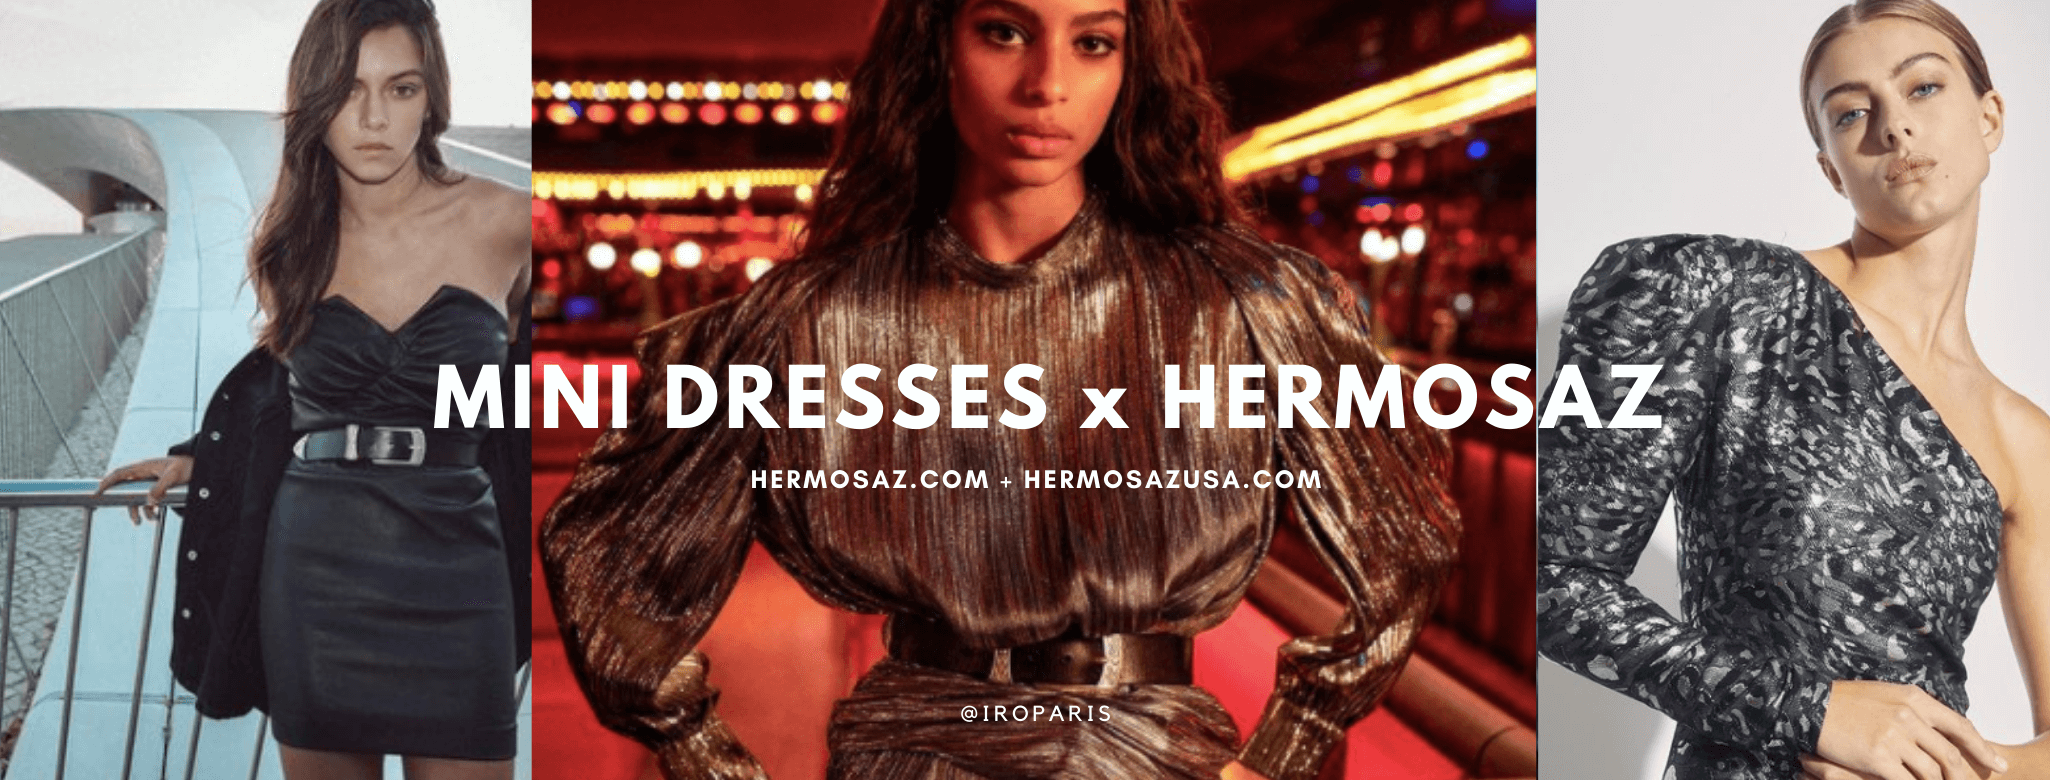 Mini dresses x Hermosaz